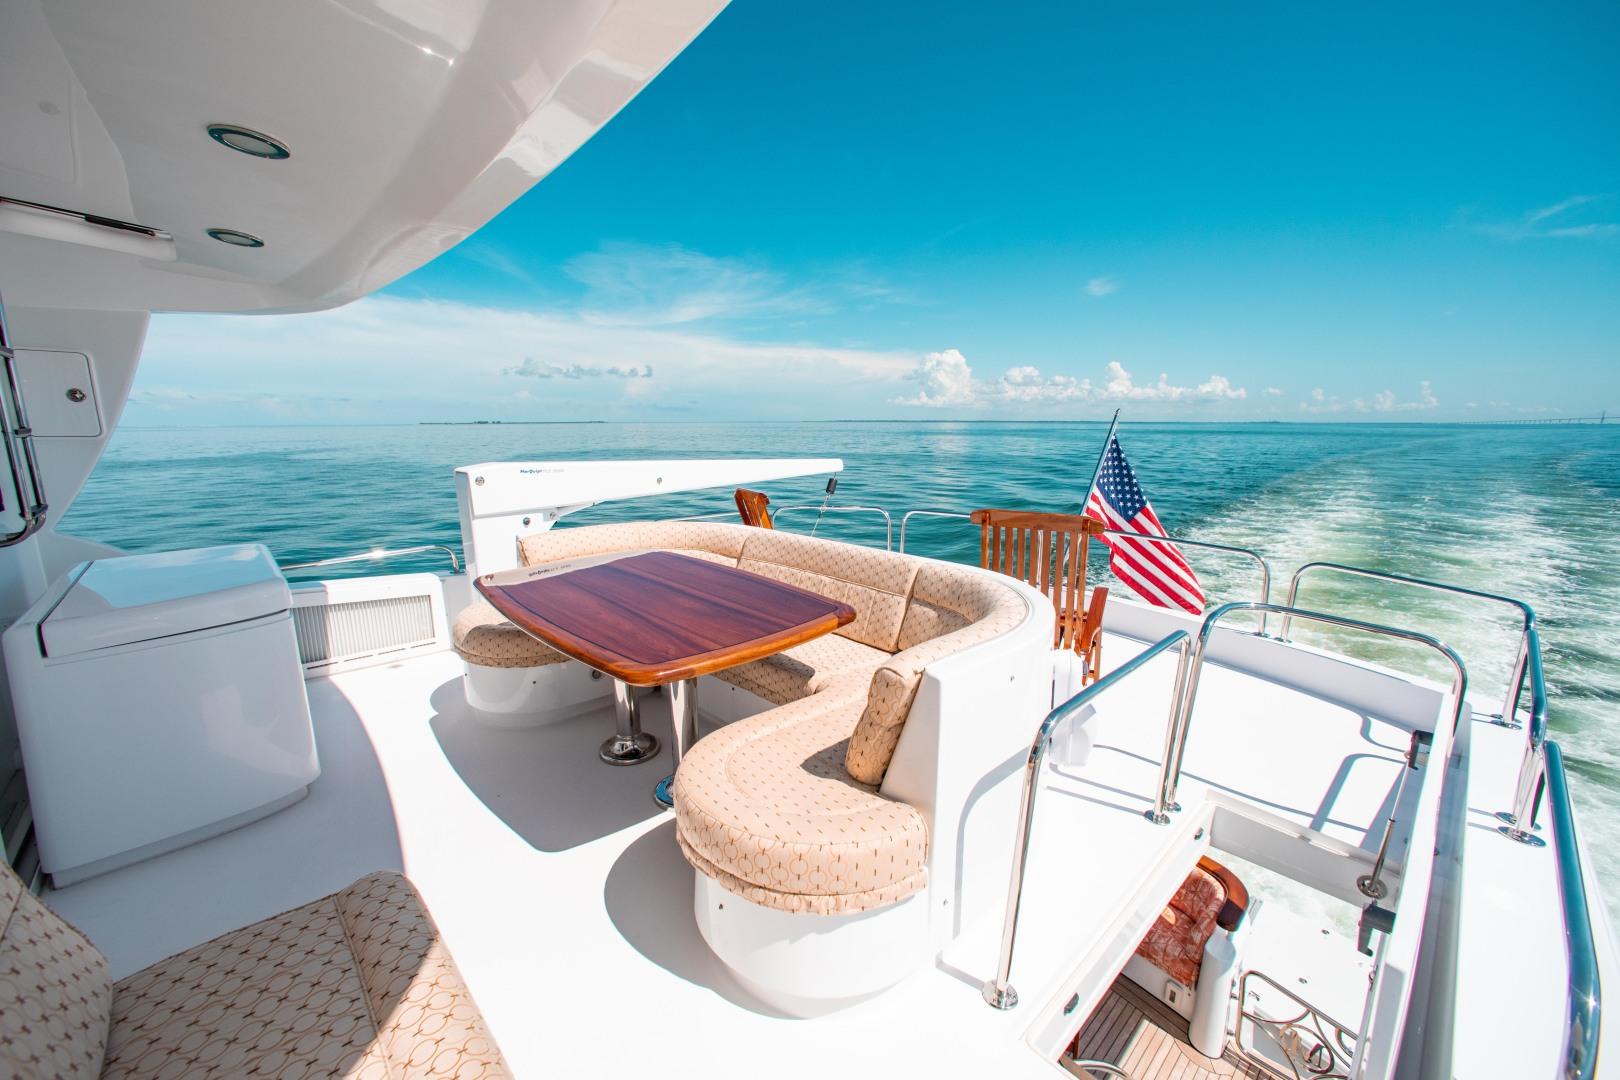 Hatteras-80 Motor Yacht 2008-Galati Yacht Sales Trade Anna Maria-Florida-United States-2008 Hatteras 80 Motor Yacht  Galati Yacht Sales Trade  Skylounge Aft Deck-1466261 | Thumbnail